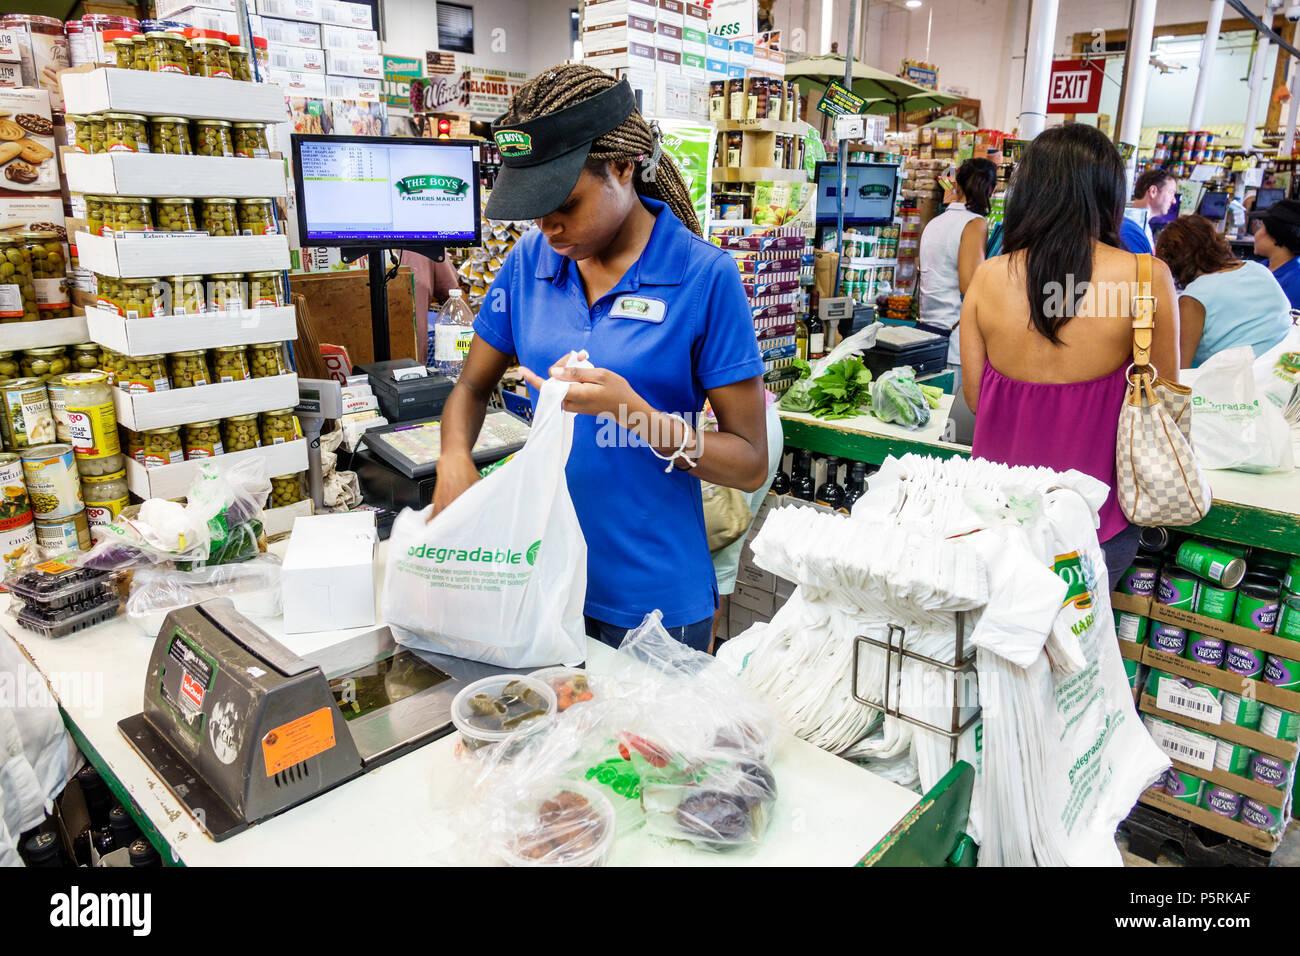 Supermarket Plastic Bag Stock Photos Supermarket Plastic